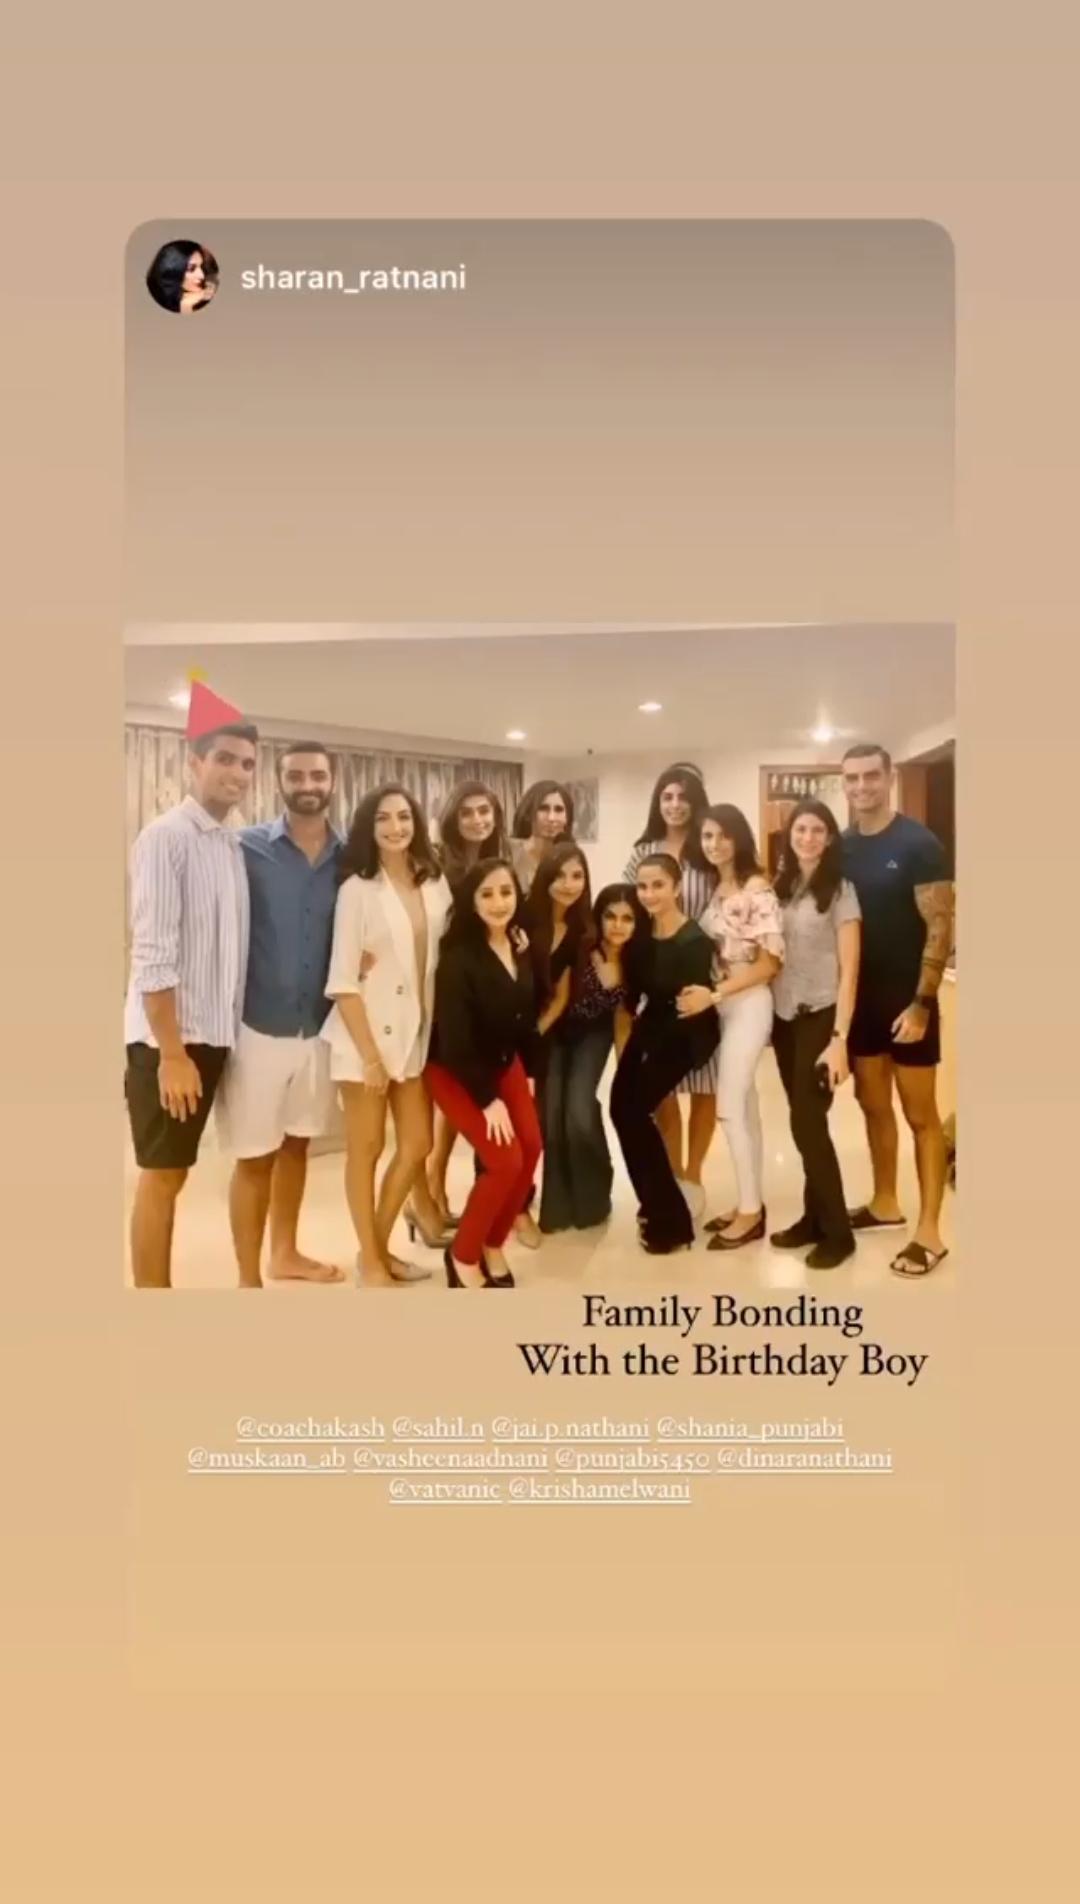 Family Bonding With the Birthday Boy